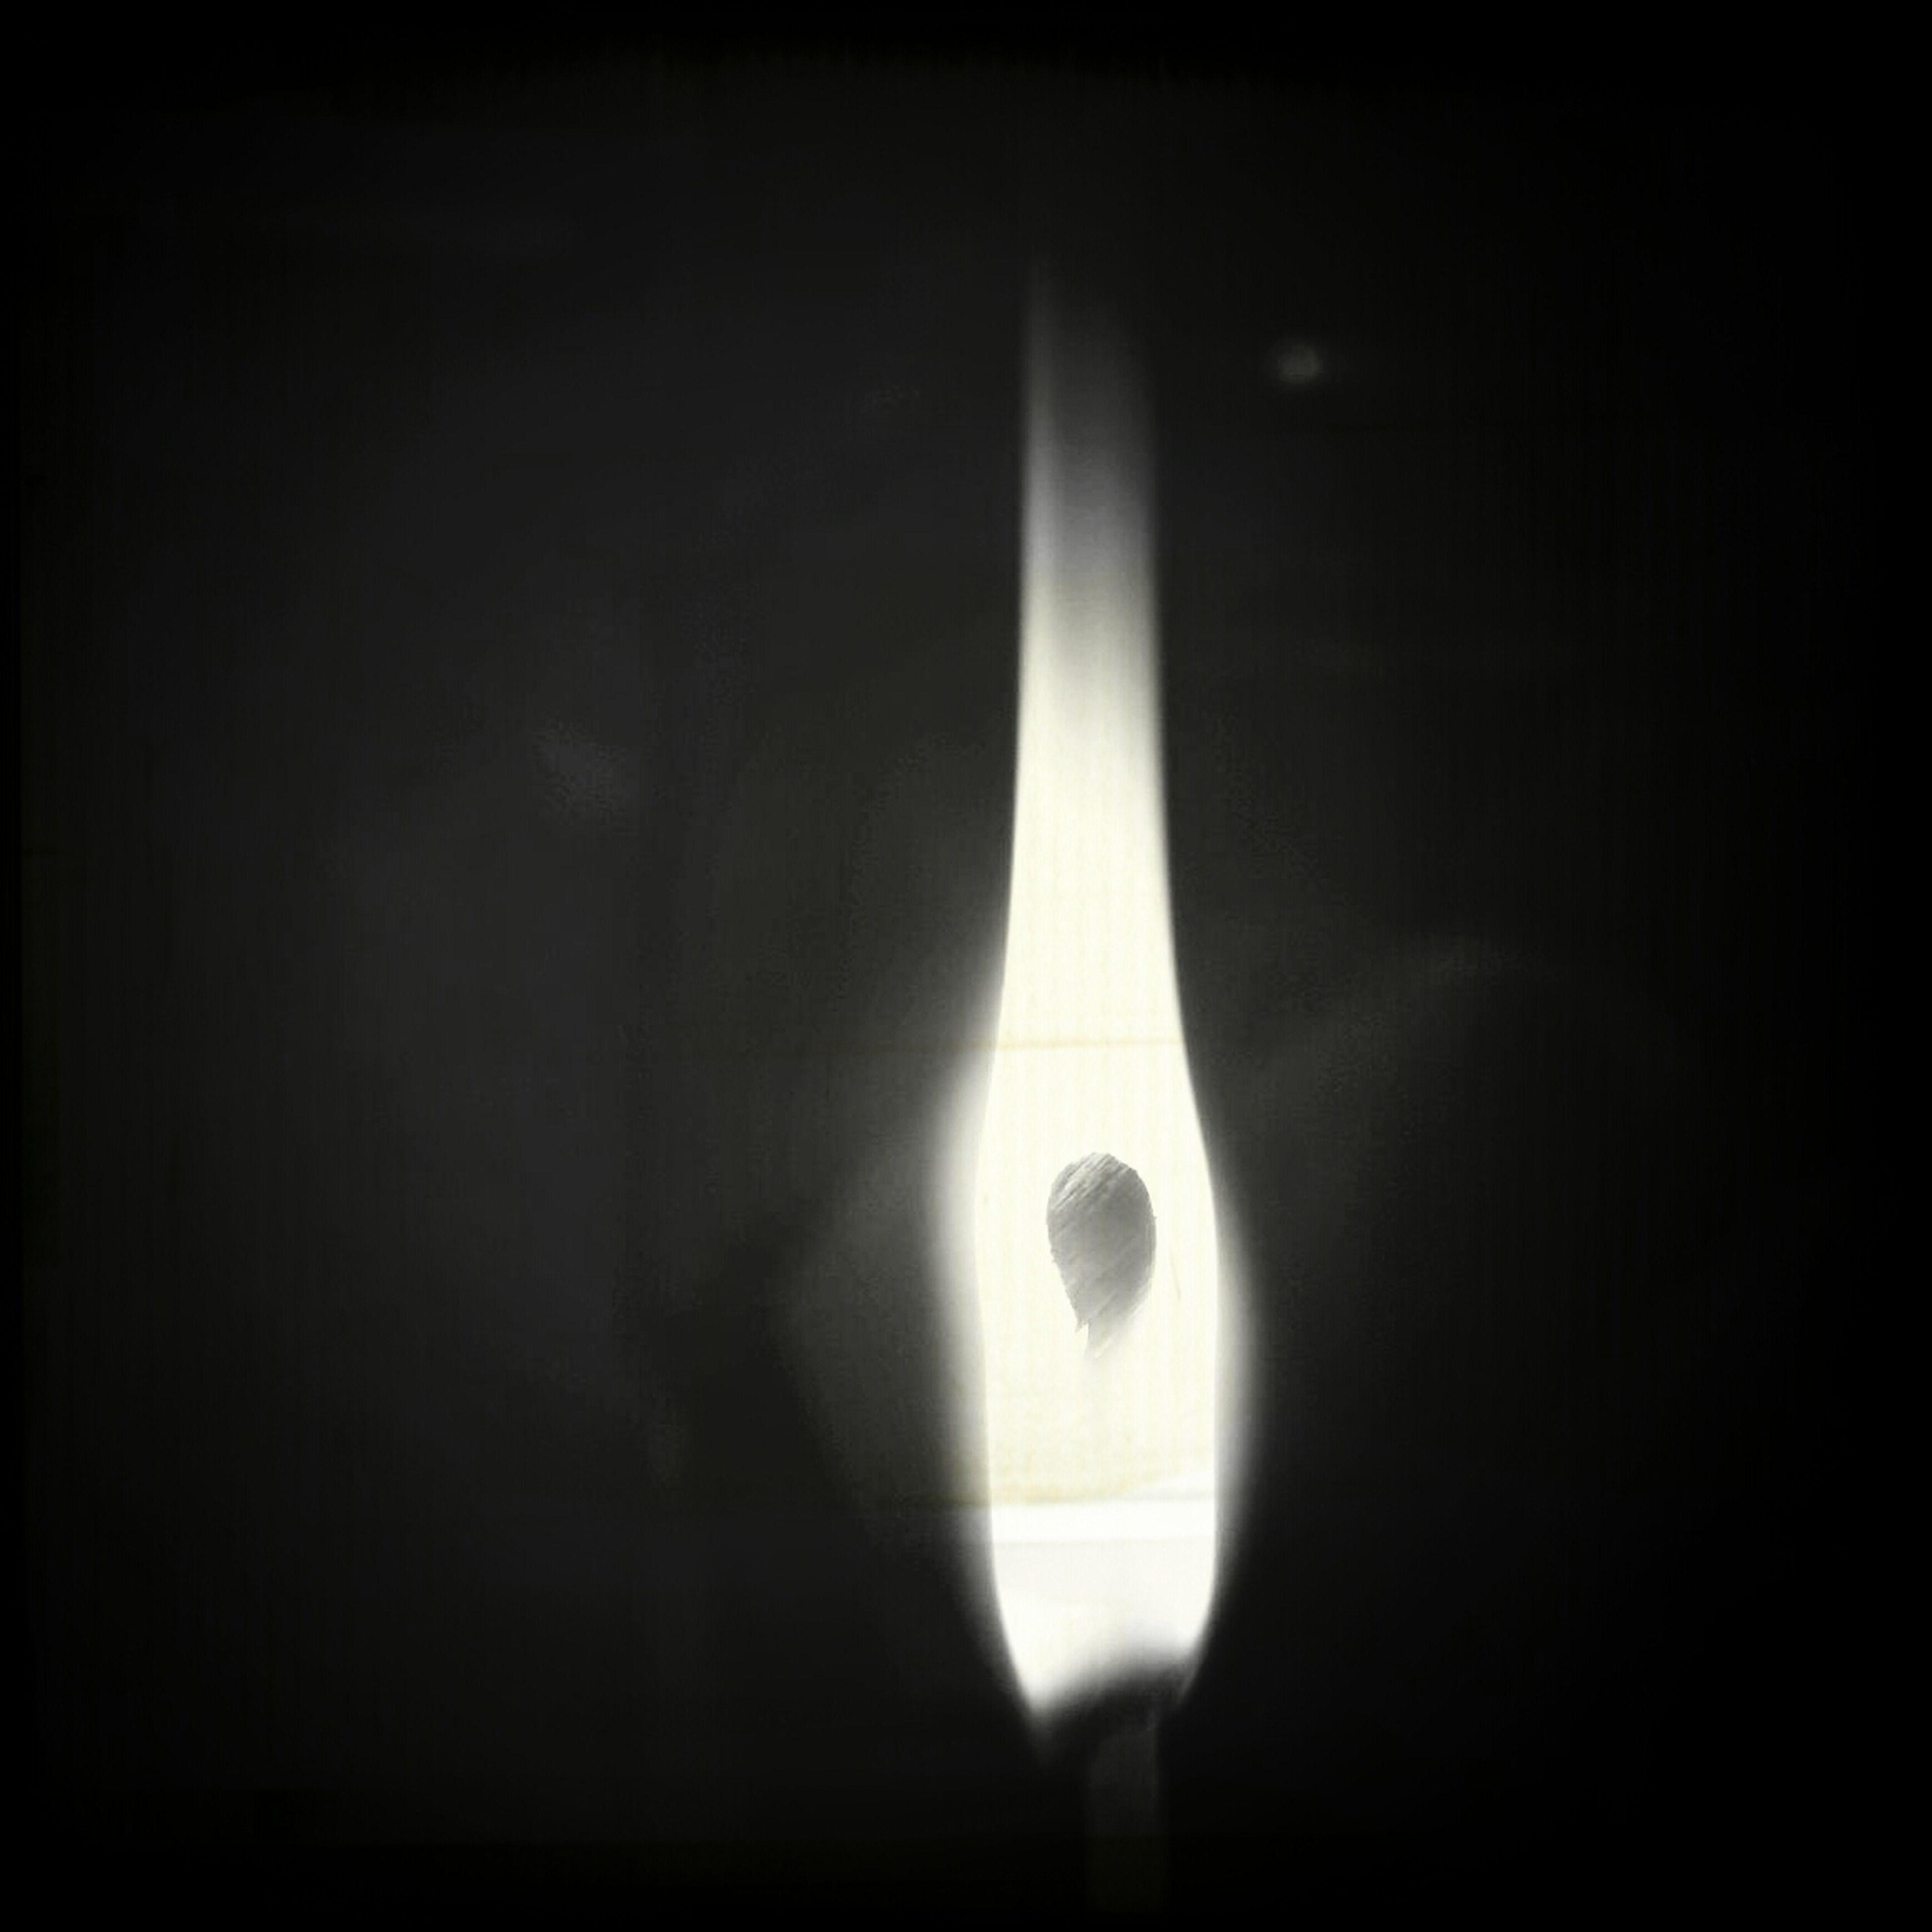 indoors, illuminated, lighting equipment, darkroom, dark, lit, glowing, electricity, electric lamp, light - natural phenomenon, electric light, lamp, ceiling, copy space, black background, candle, light bulb, studio shot, light, hanging